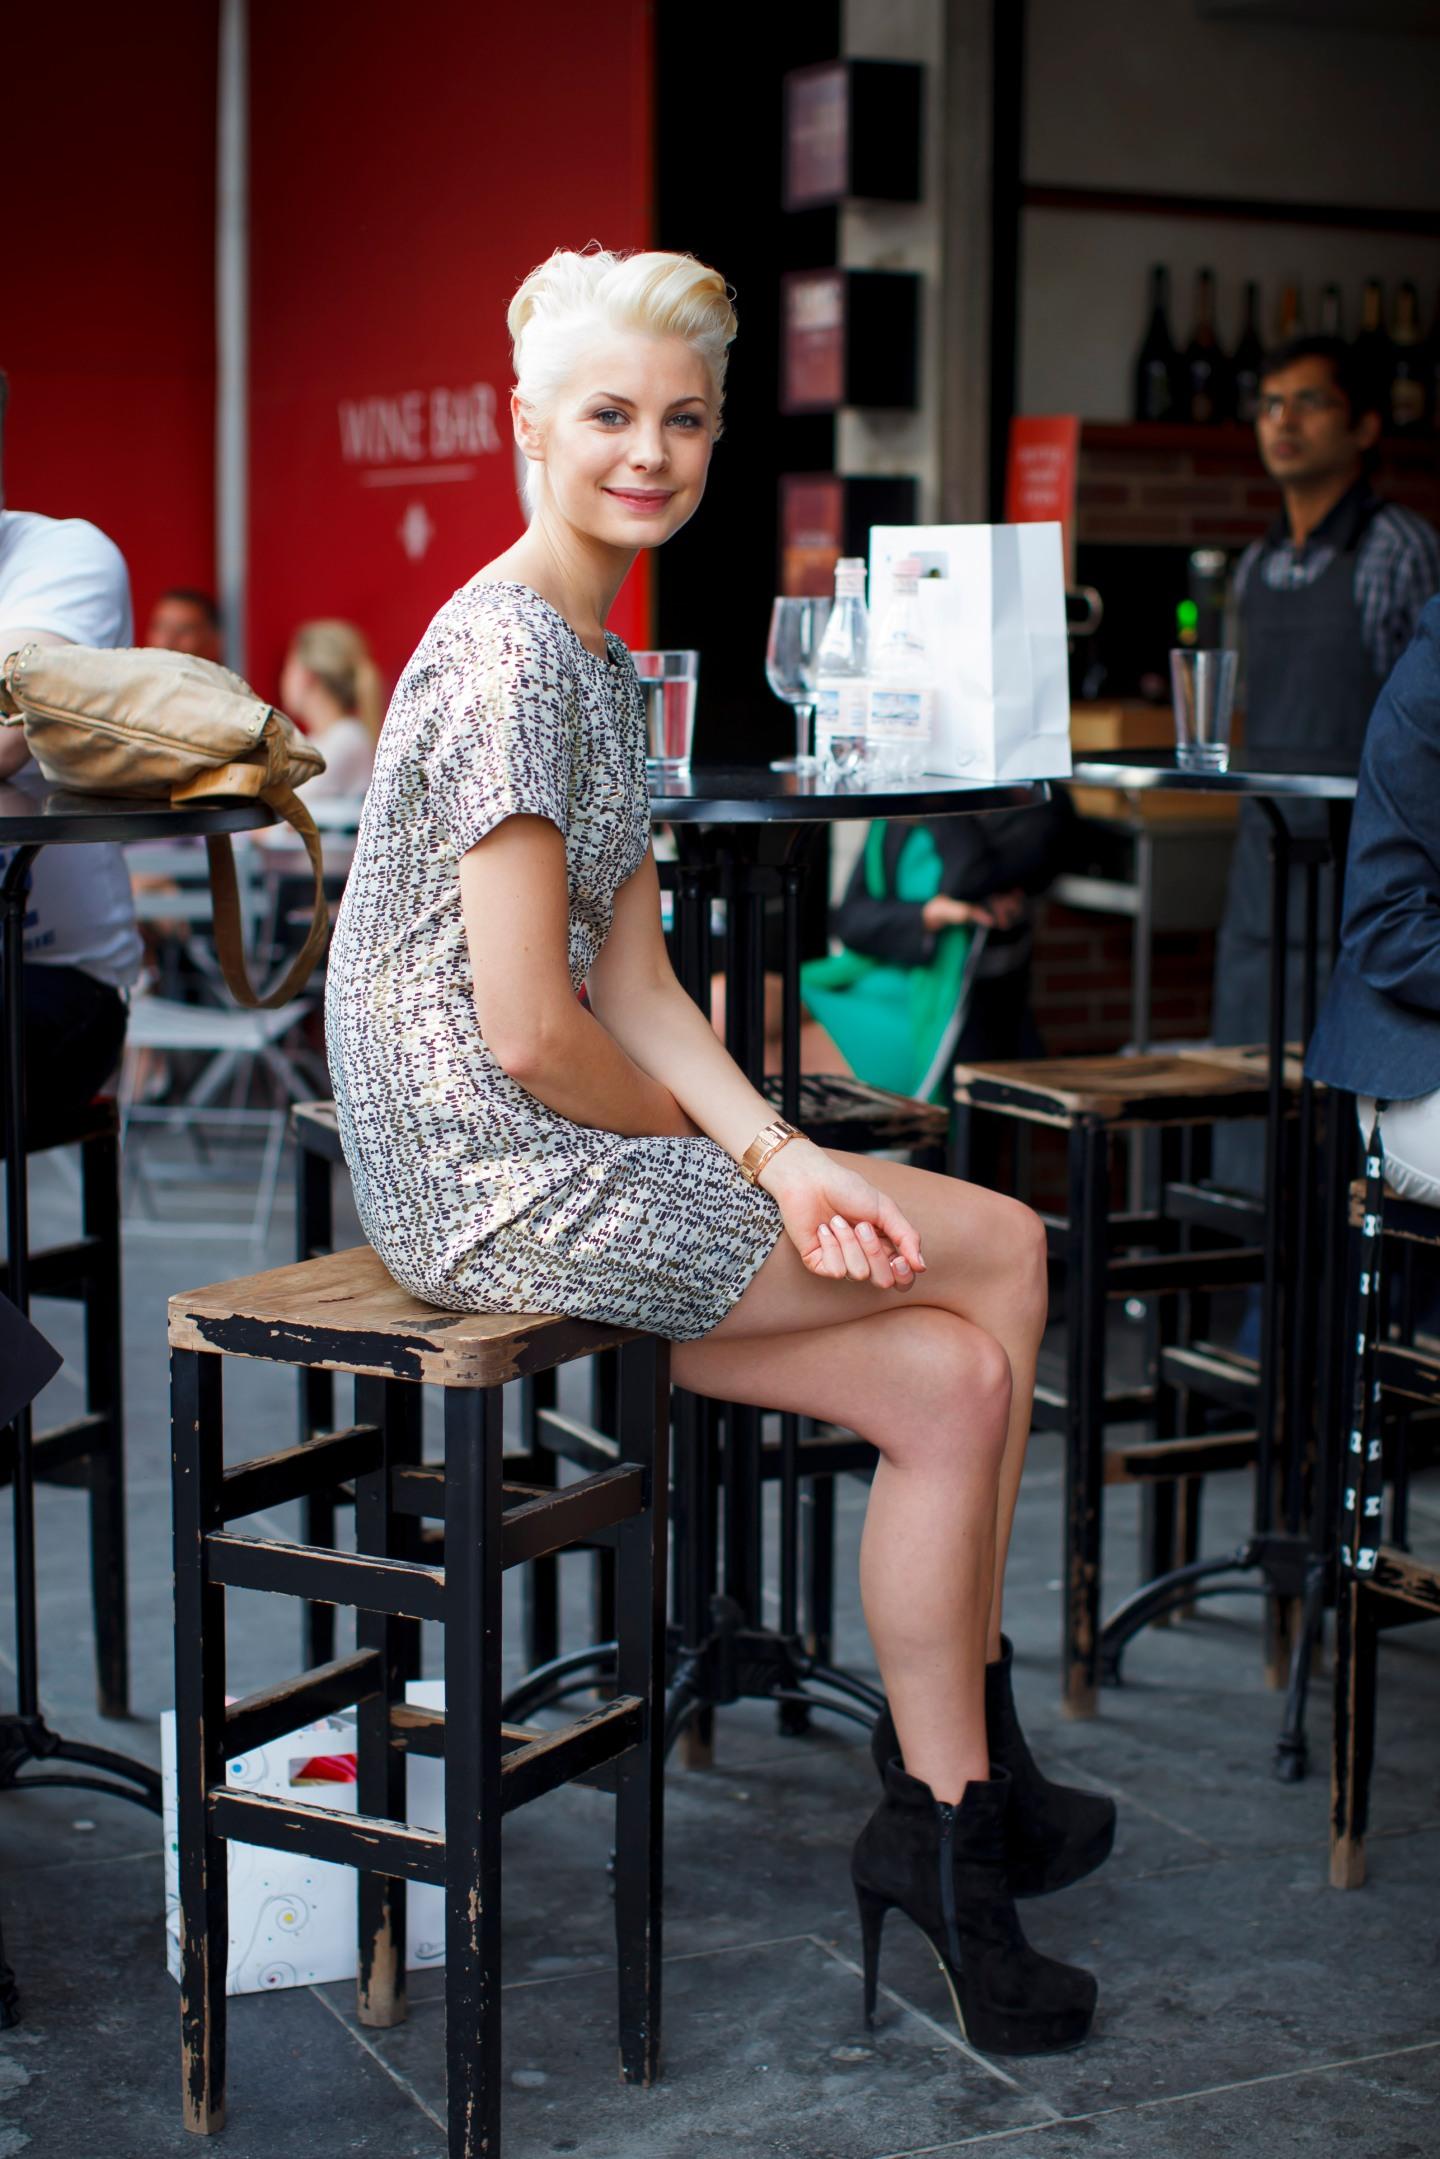 Shift dress, metallic, booties, your ensemble, yourensemble, yourensemble.com